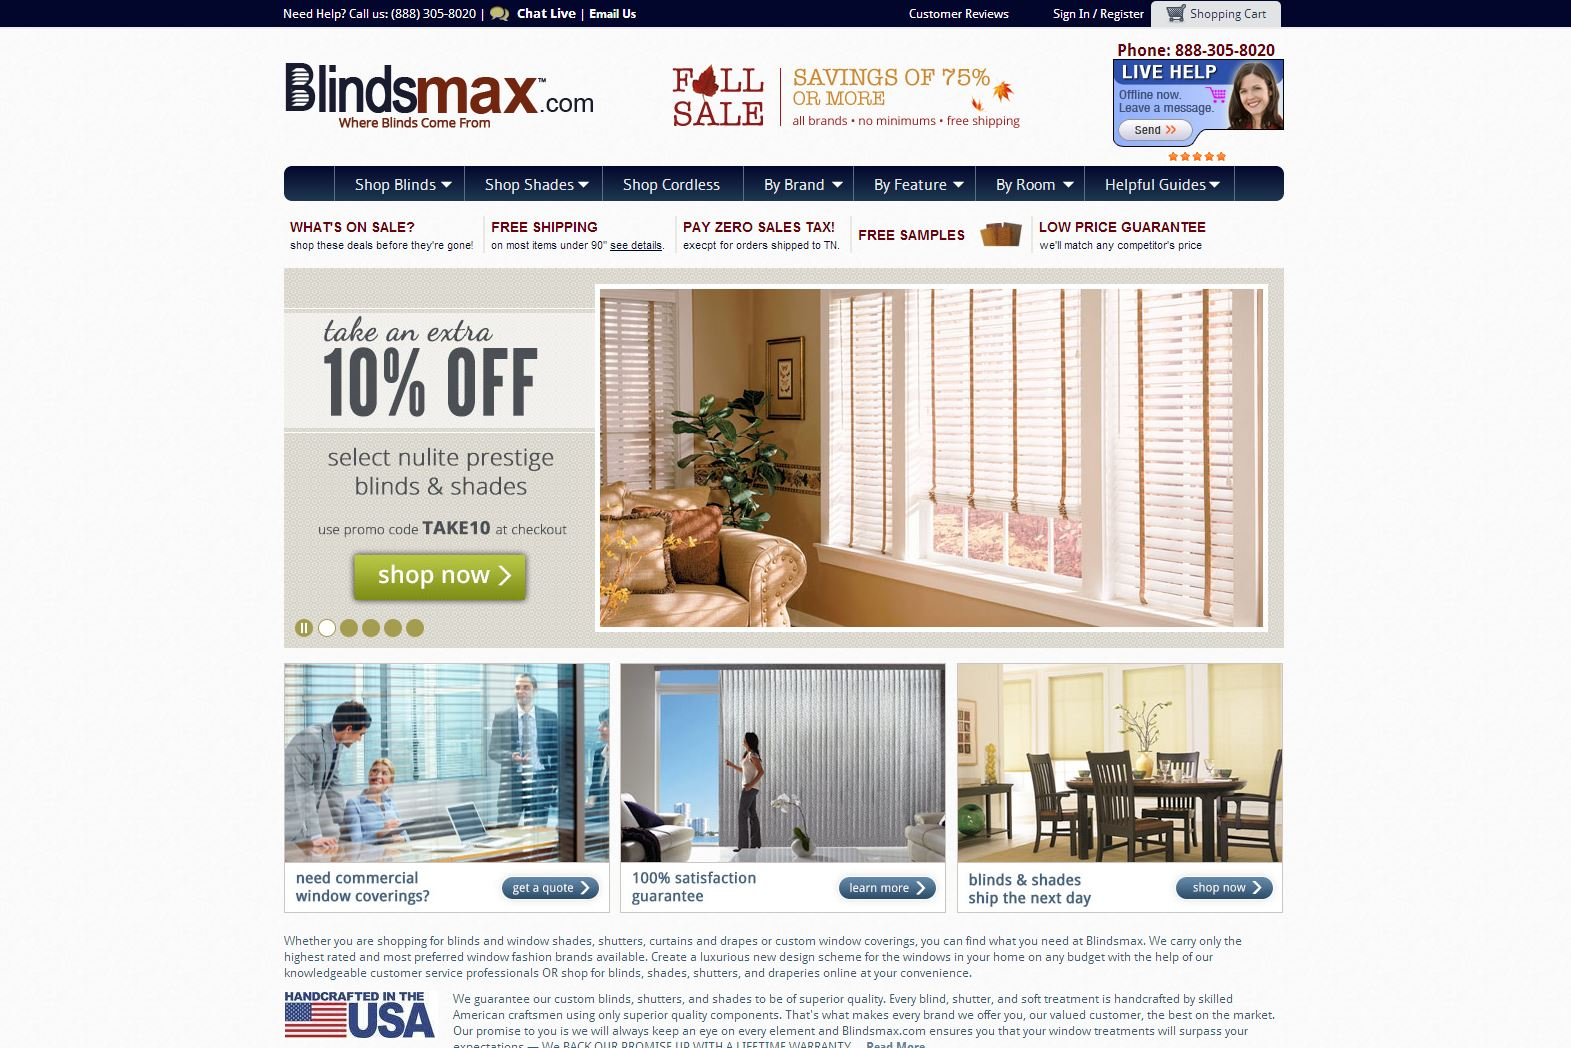 Blindsmax.com